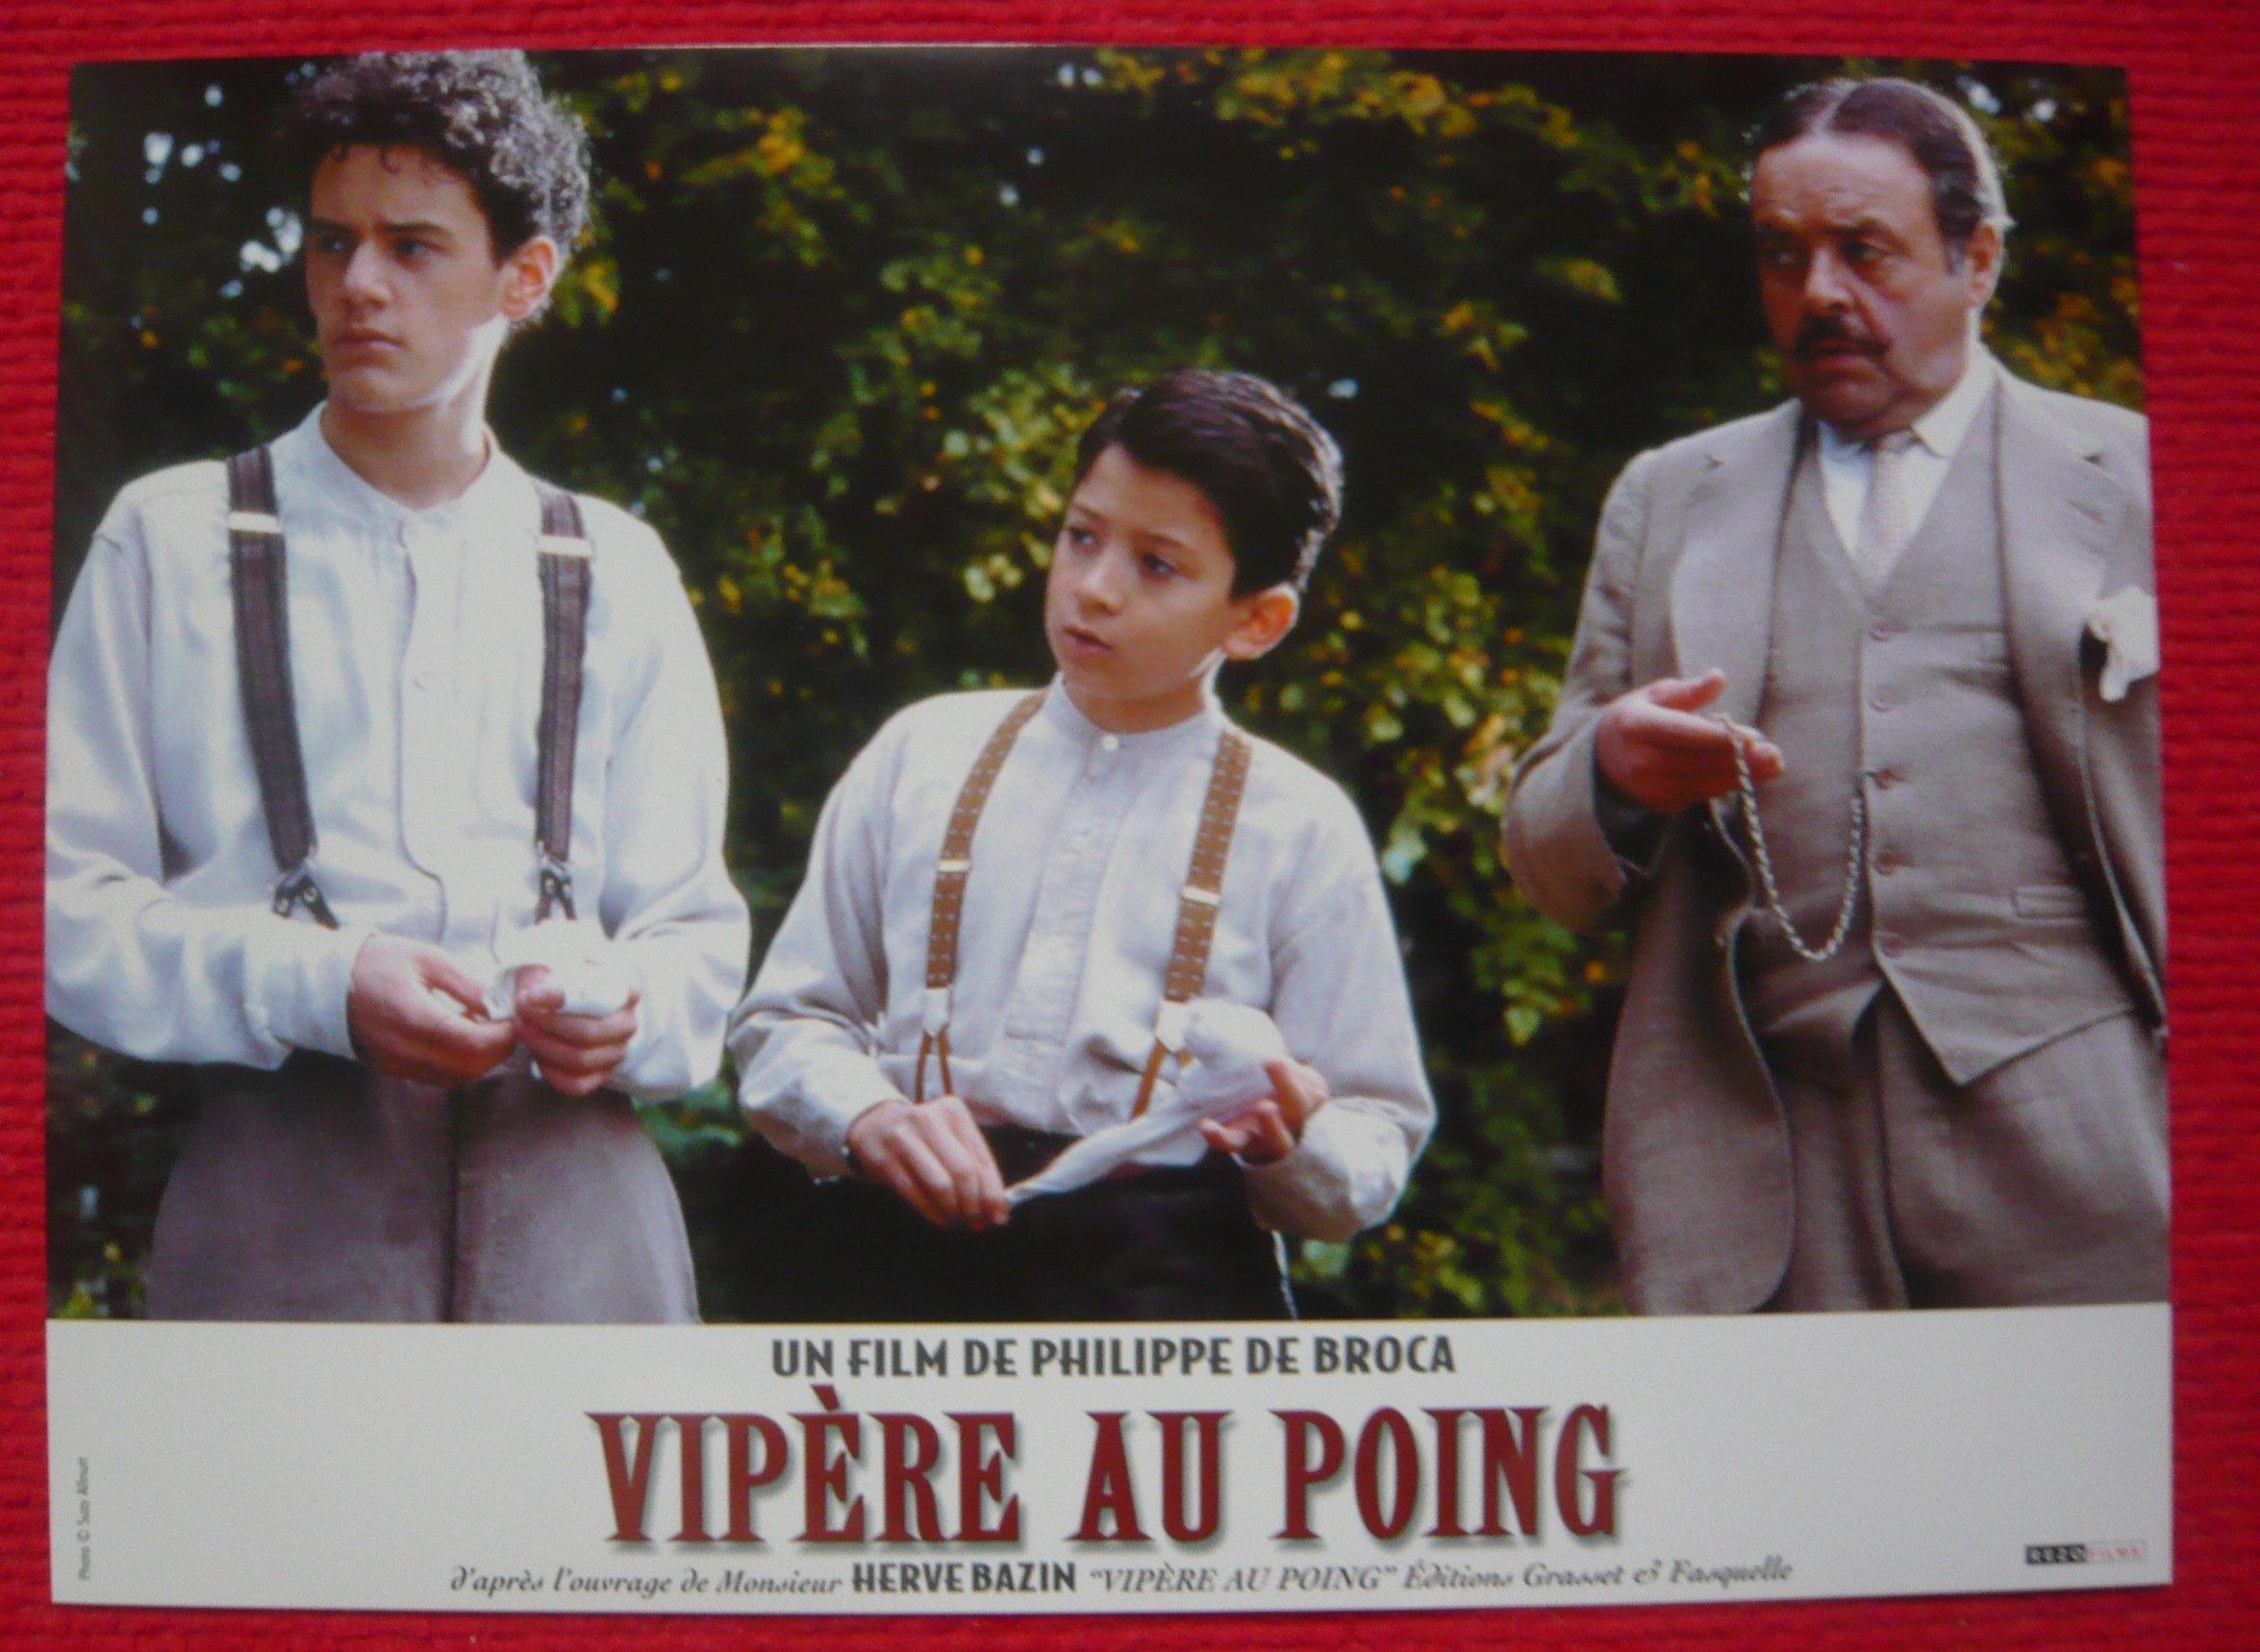 VIPERE AU POING 2004 TÉLÉCHARGER